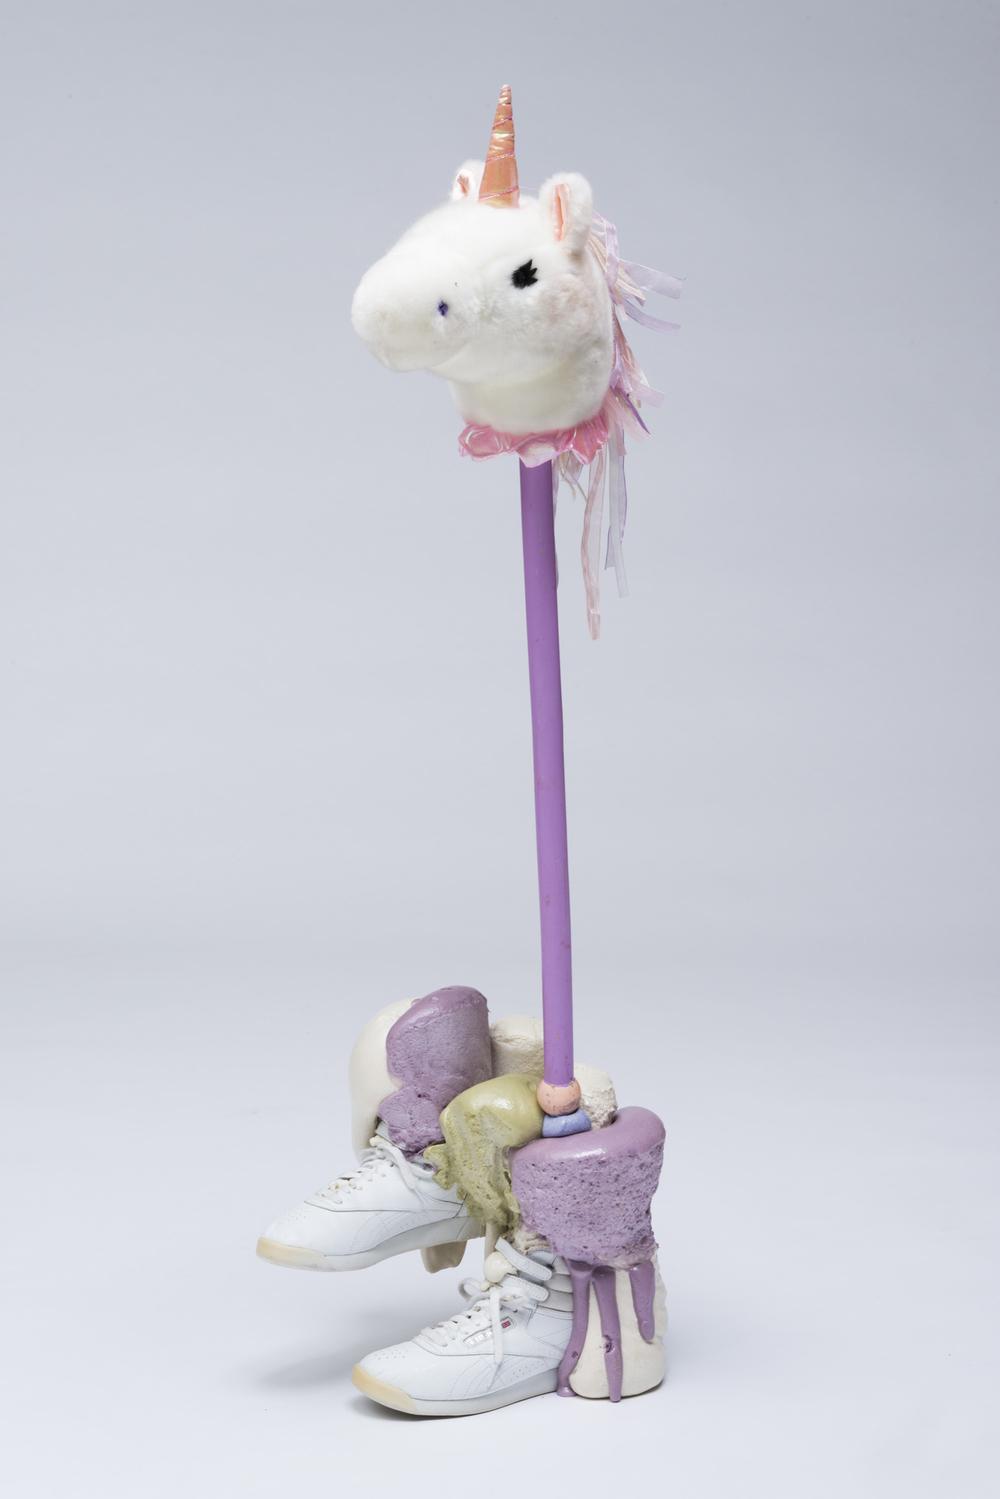 00_unicorn.jpg